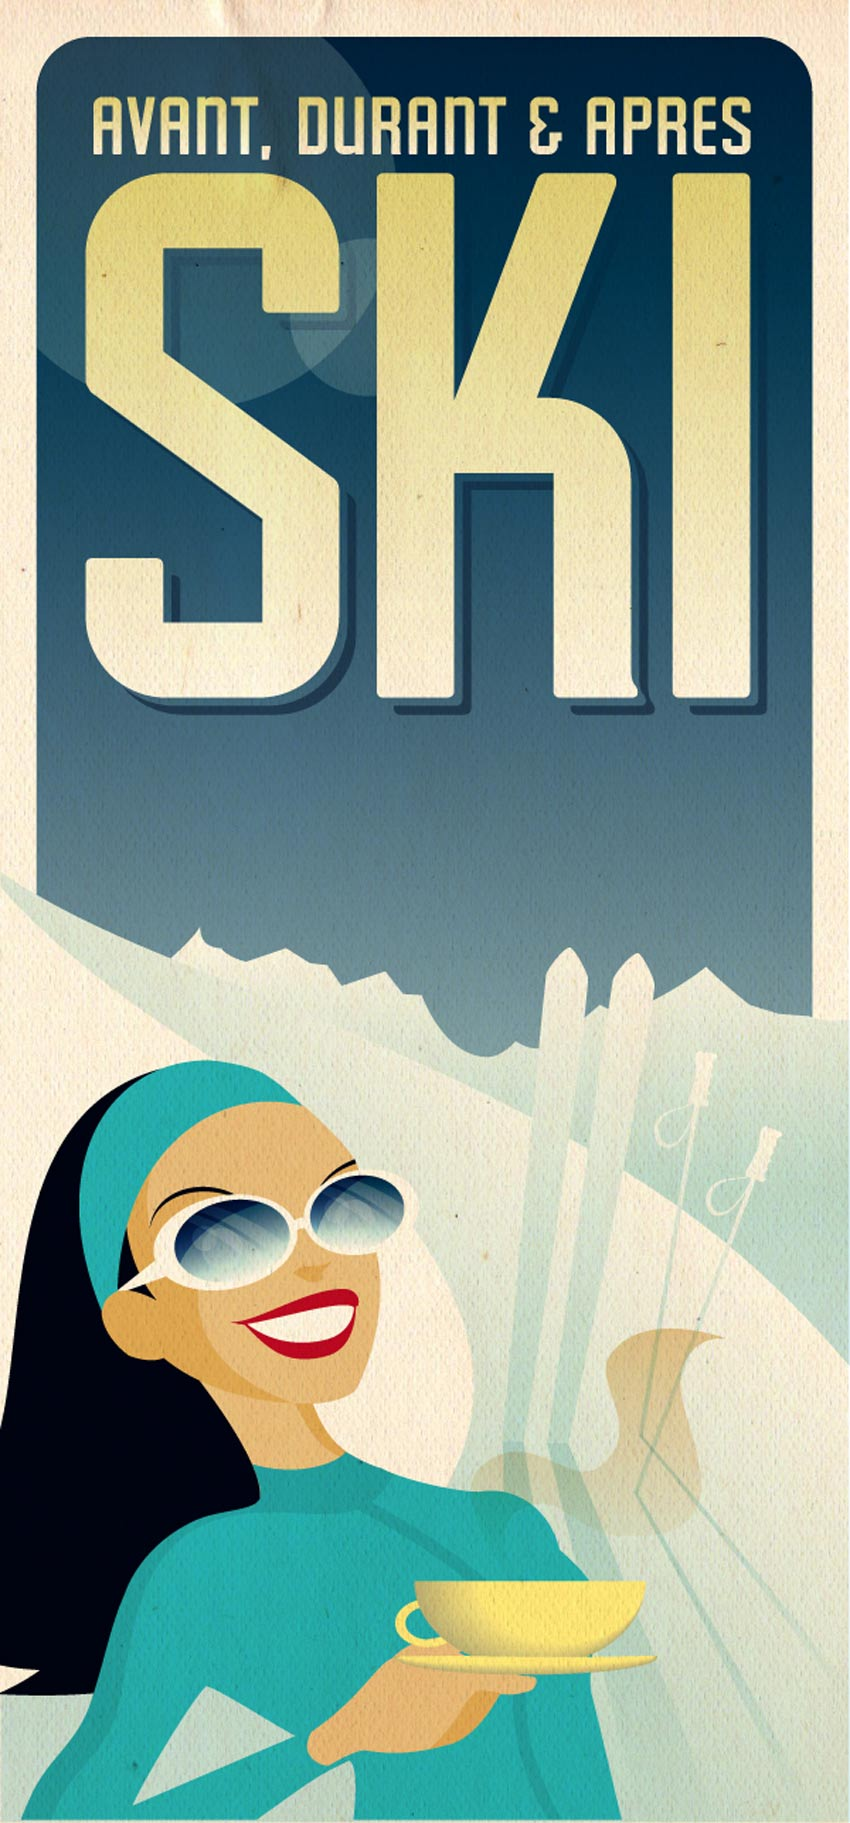 How to Create a VIntage Ski POster in Adobe Illustrator